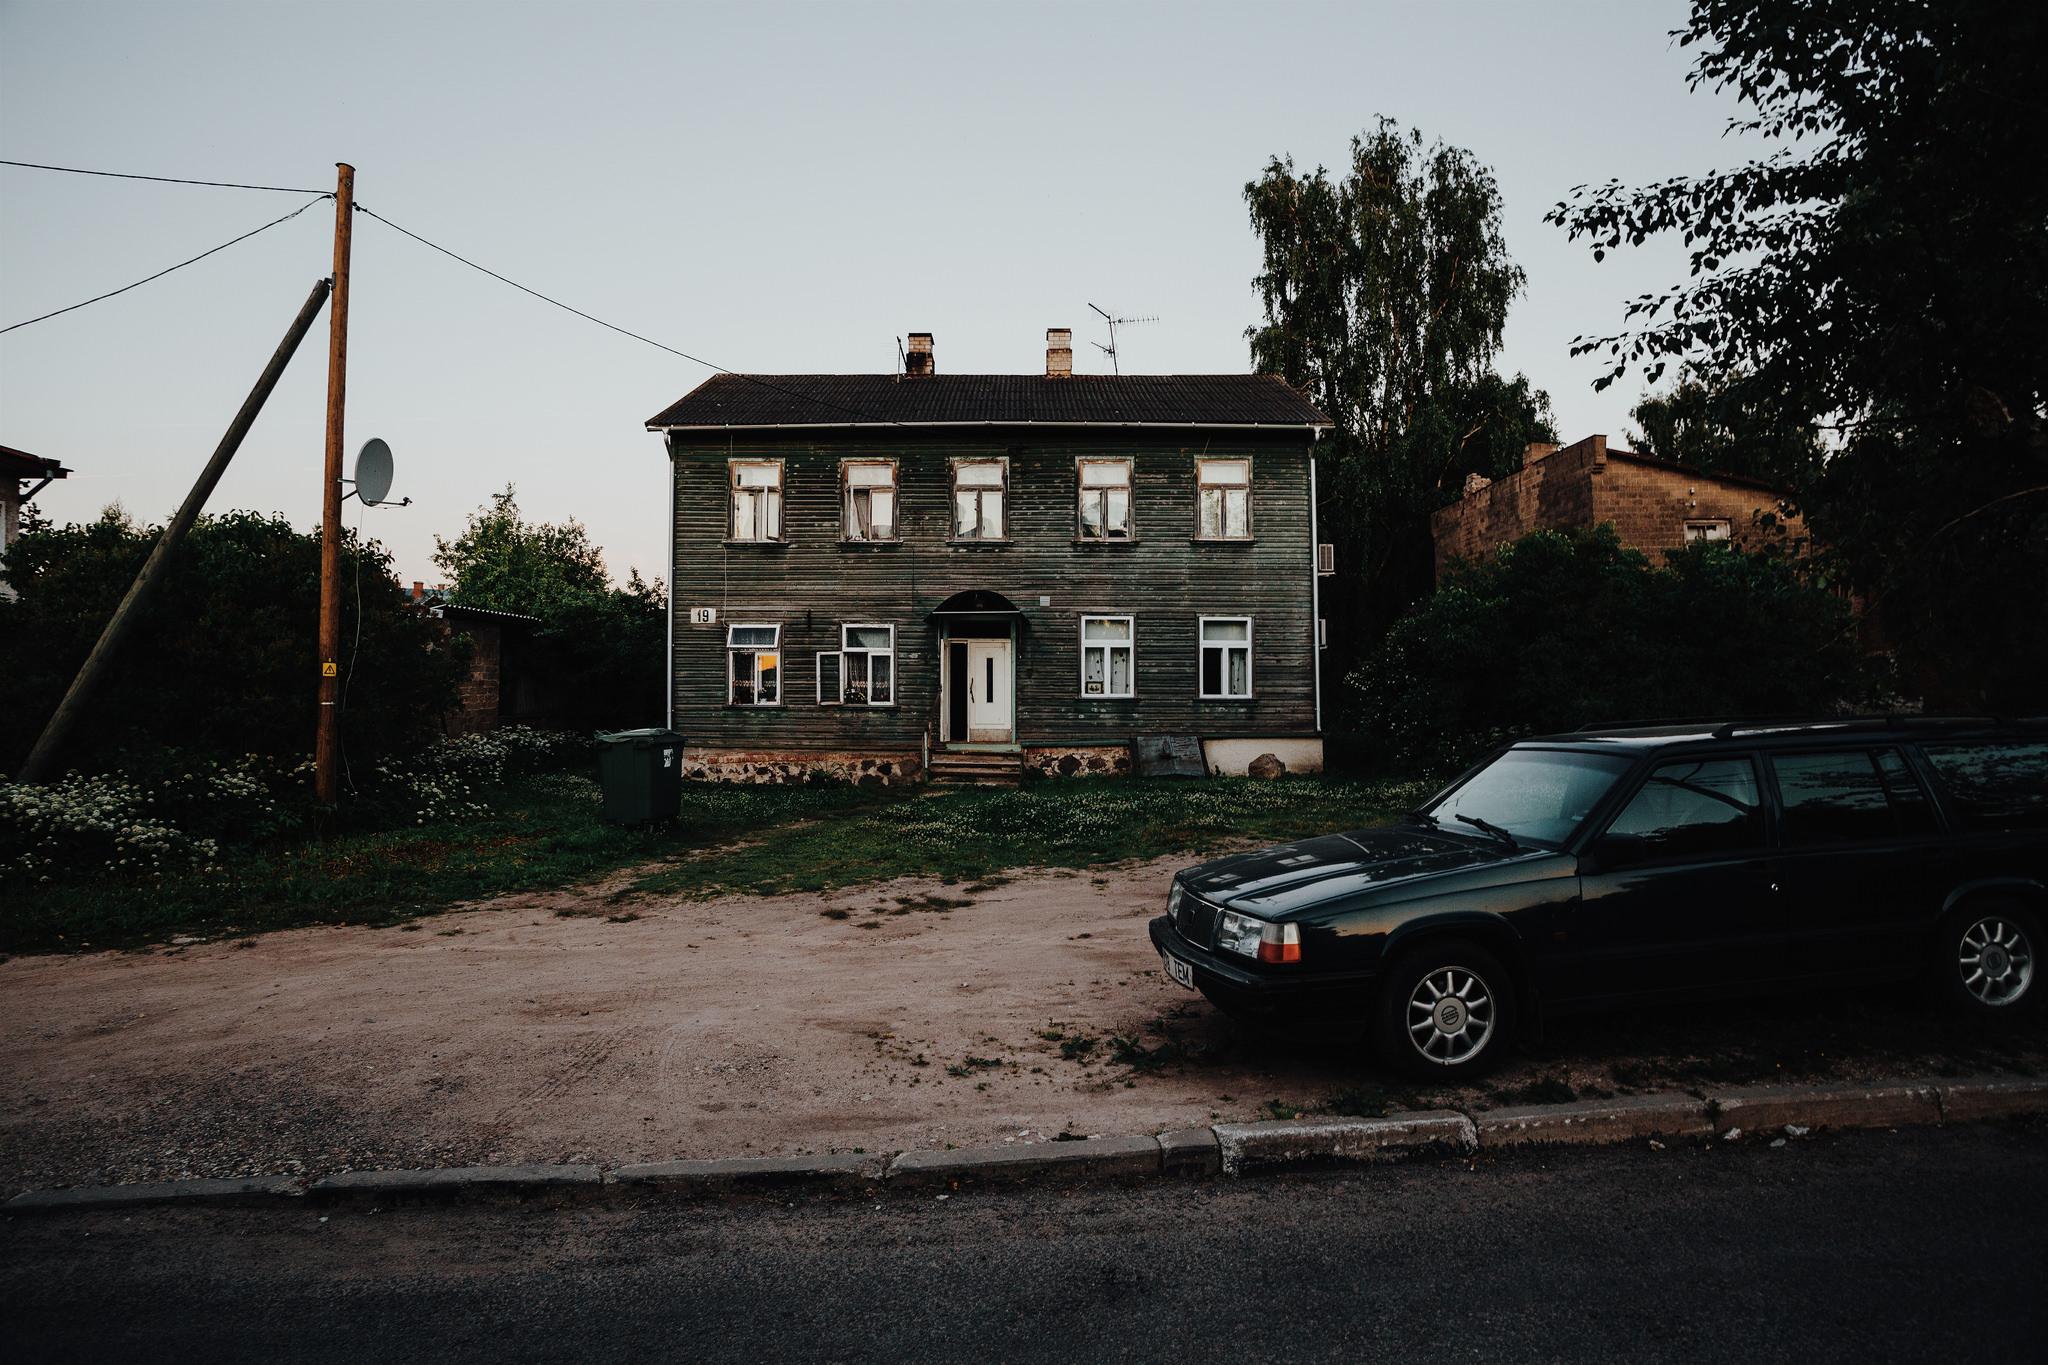 Supilinn, Tartu, Estonia, July 2015